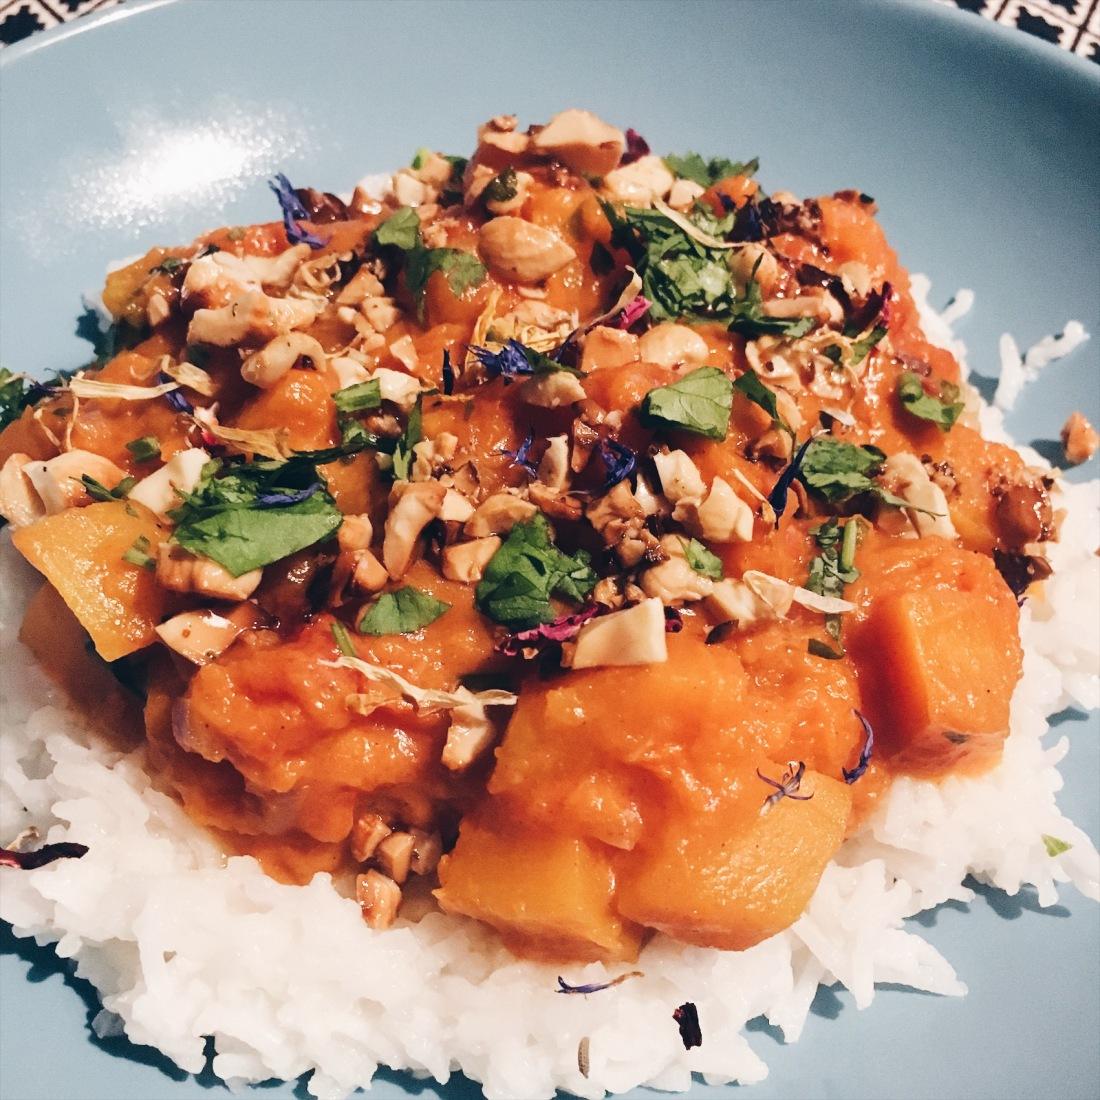 Kokos-Kürbis-Curry serviert